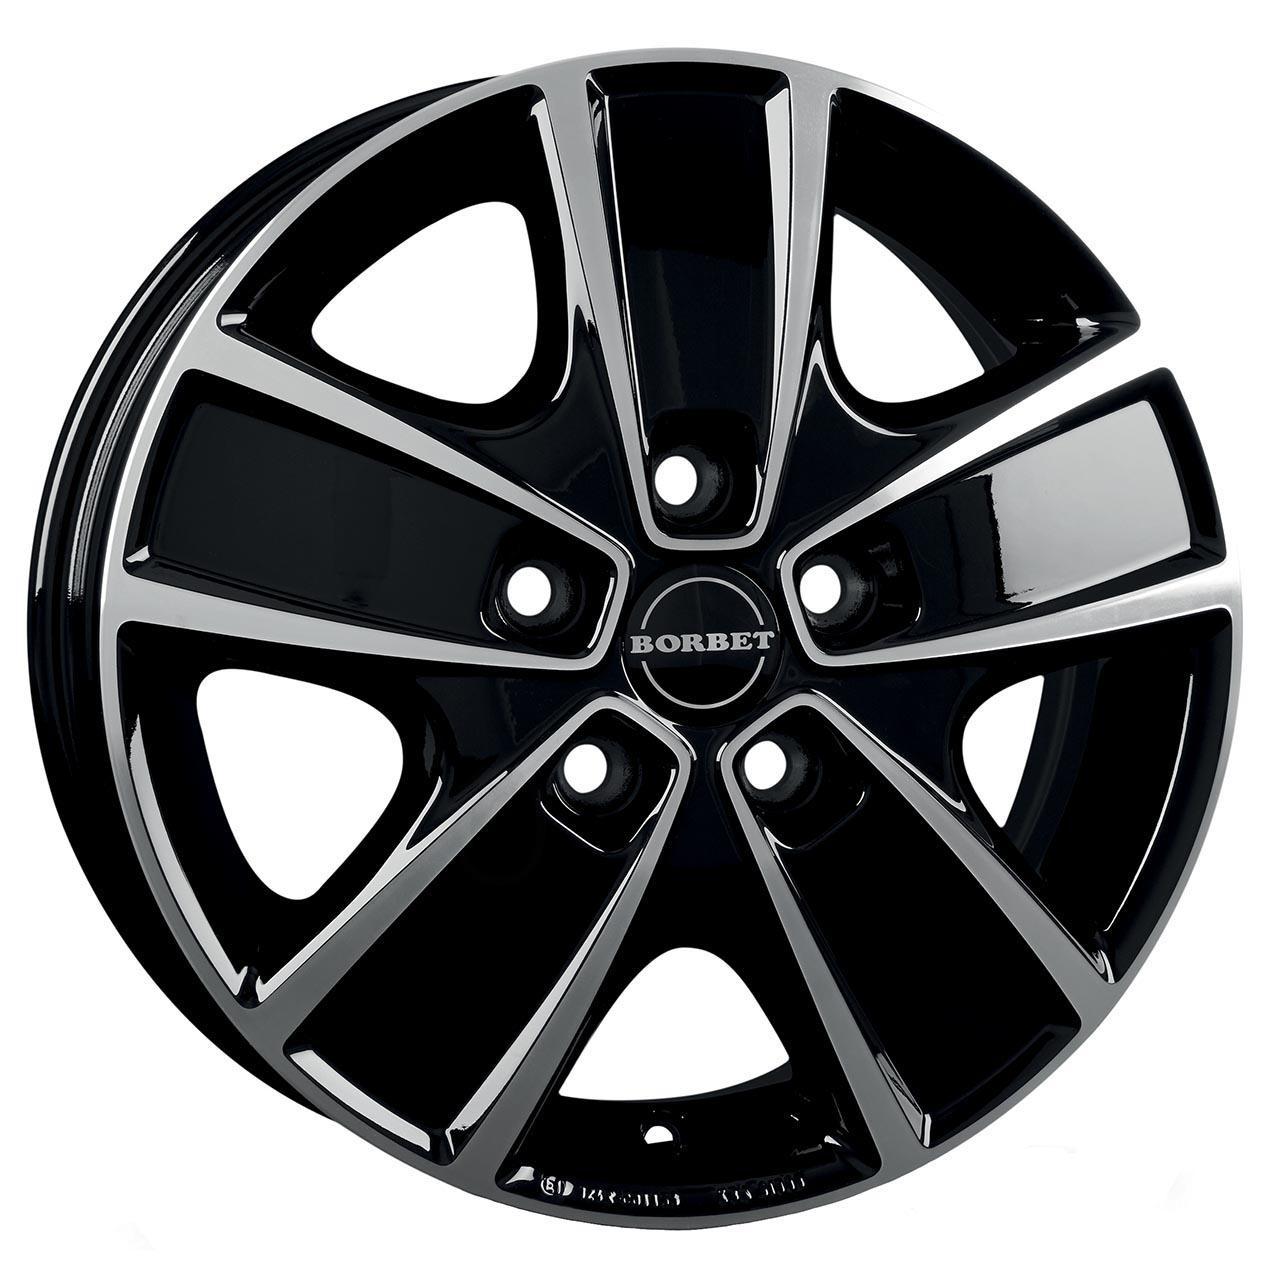 Borbet Cwg Black polished 6x16 5x130 ET68